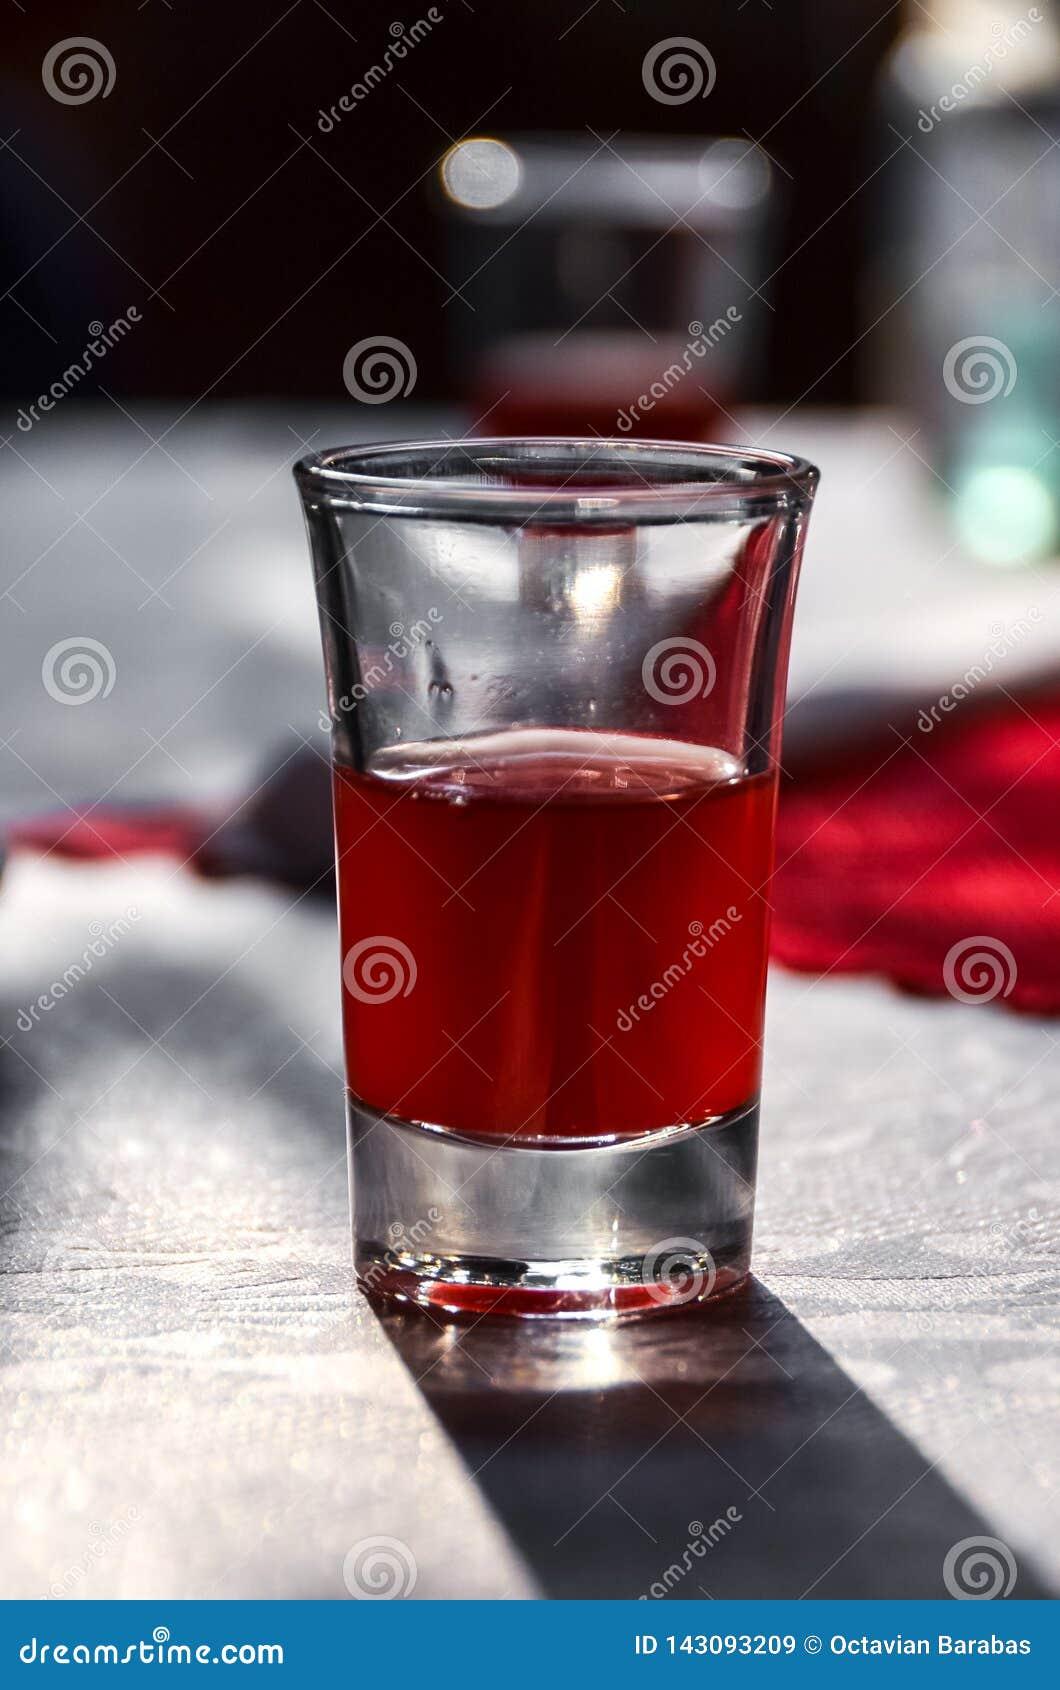 Red rice vodka from Vietnam